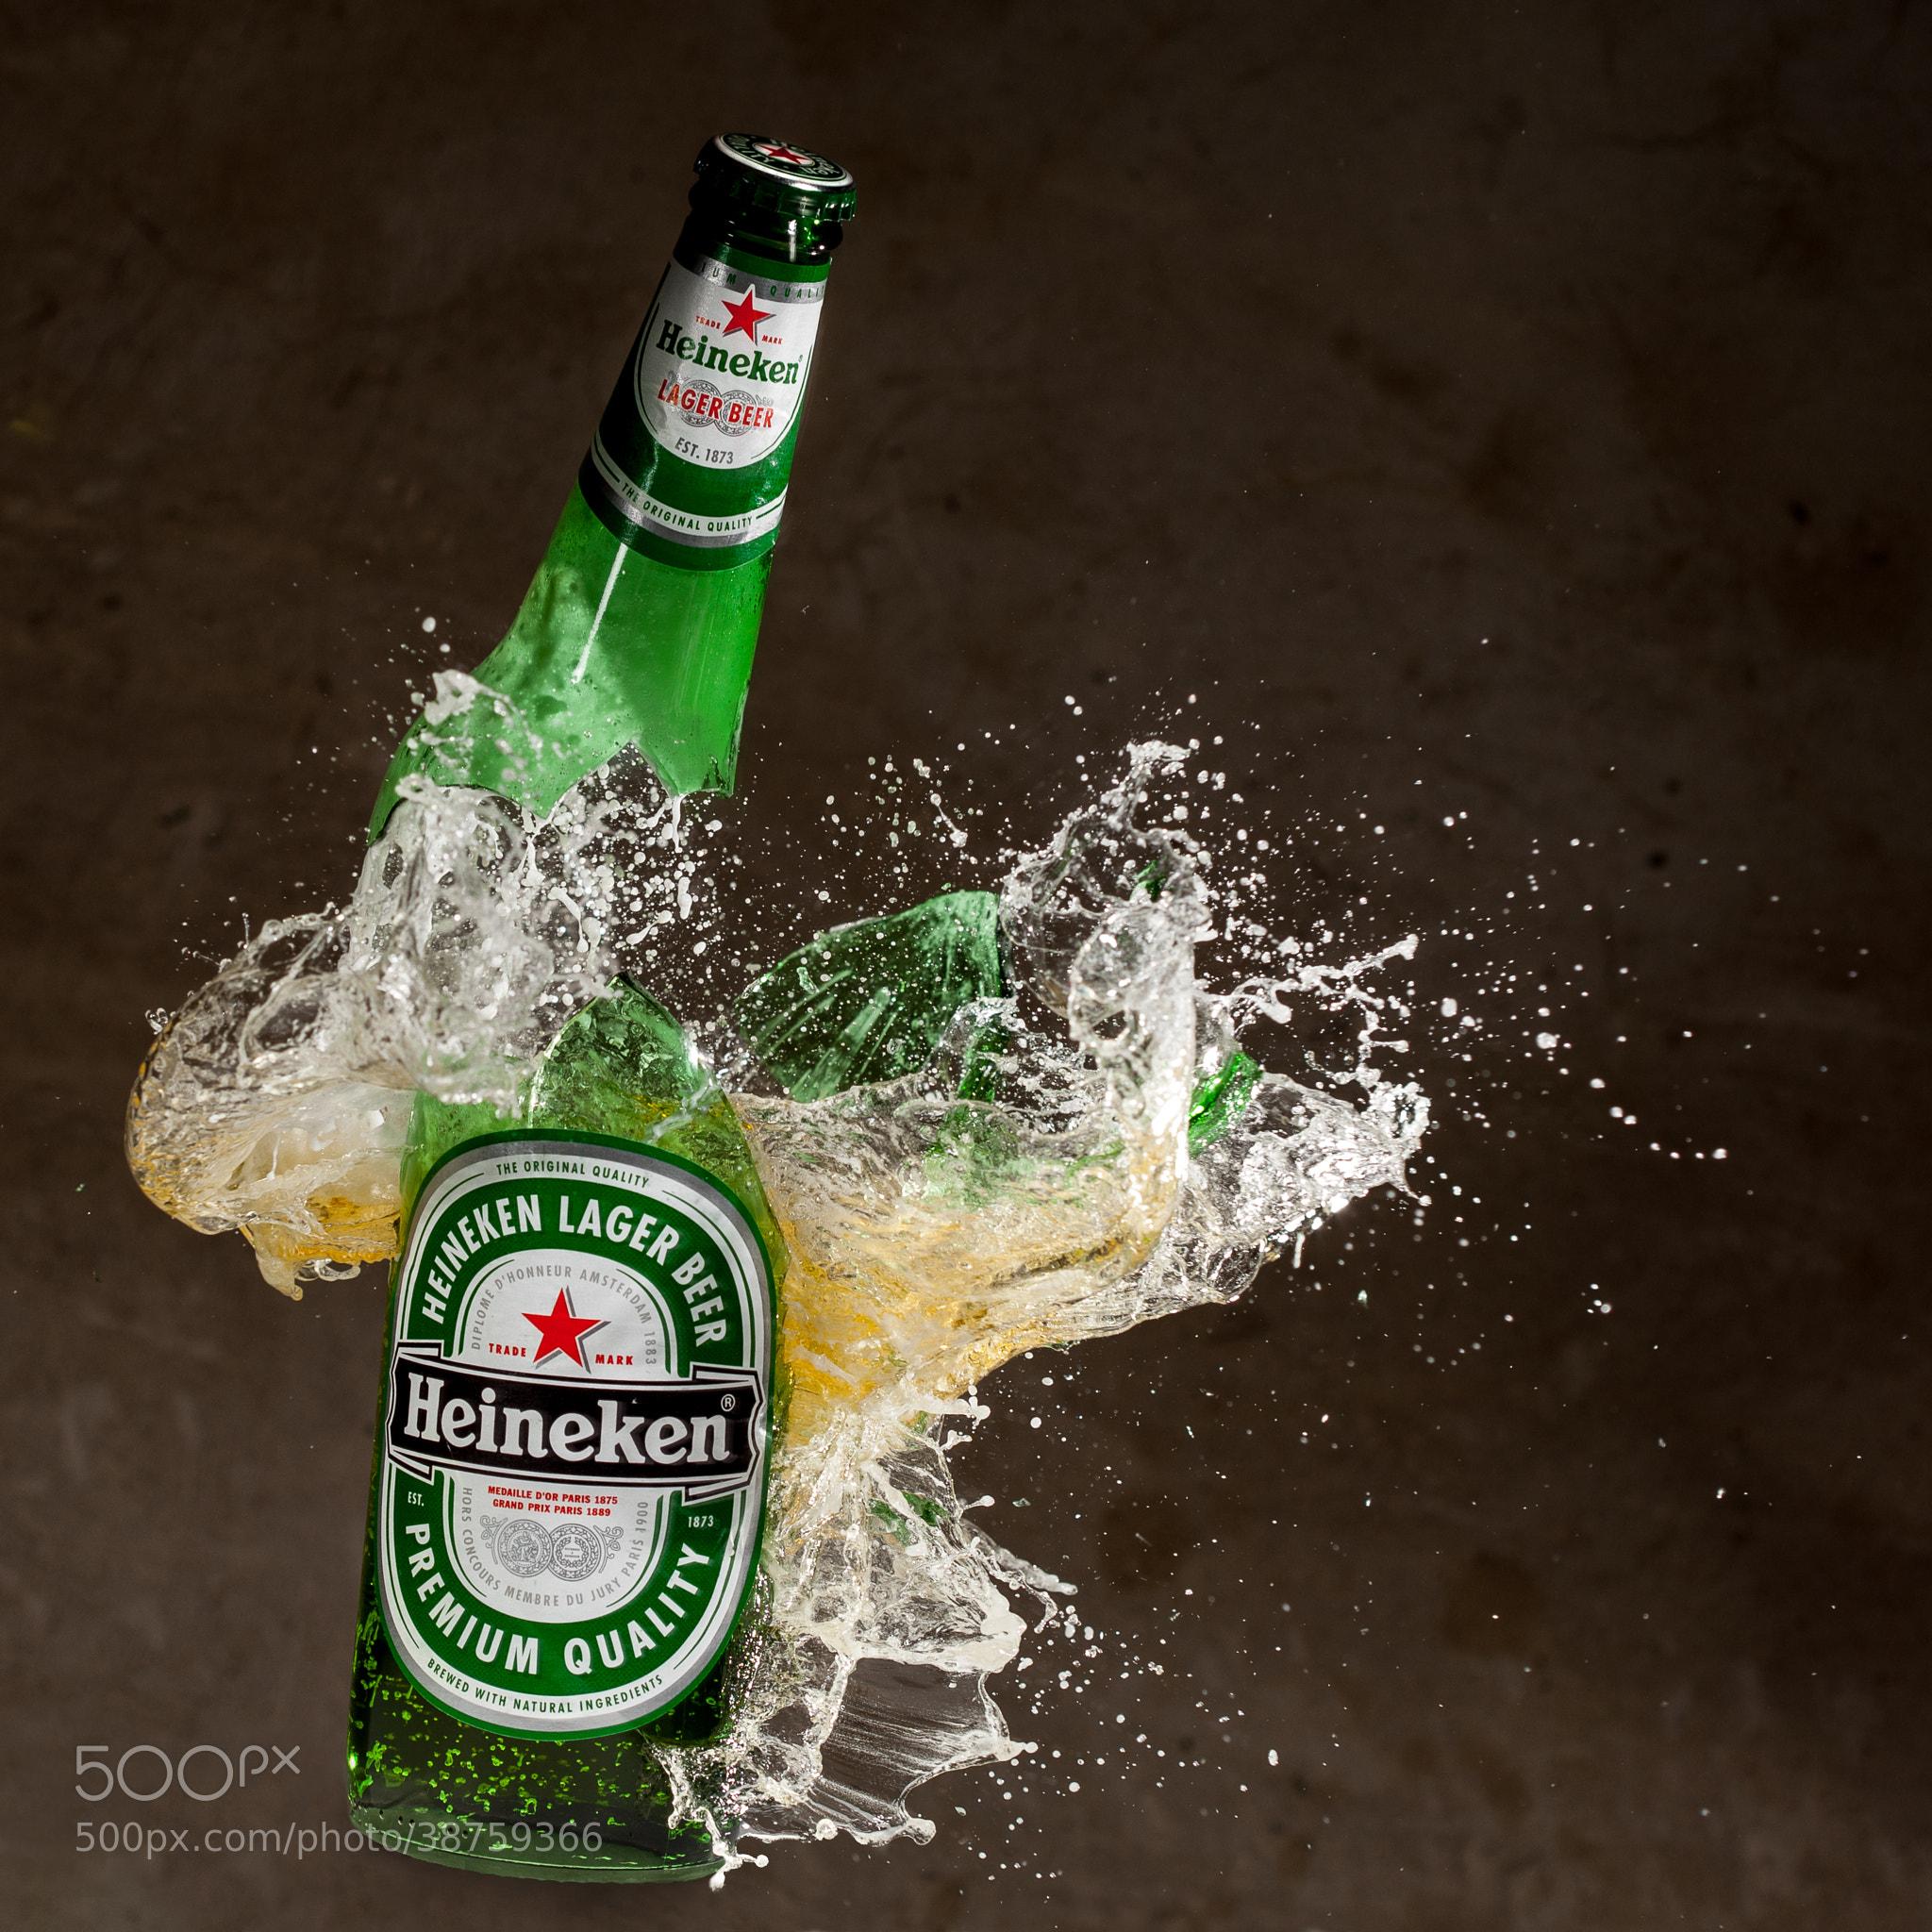 Broken Beer Bottle Stock Images, Royalty-Free Images ...